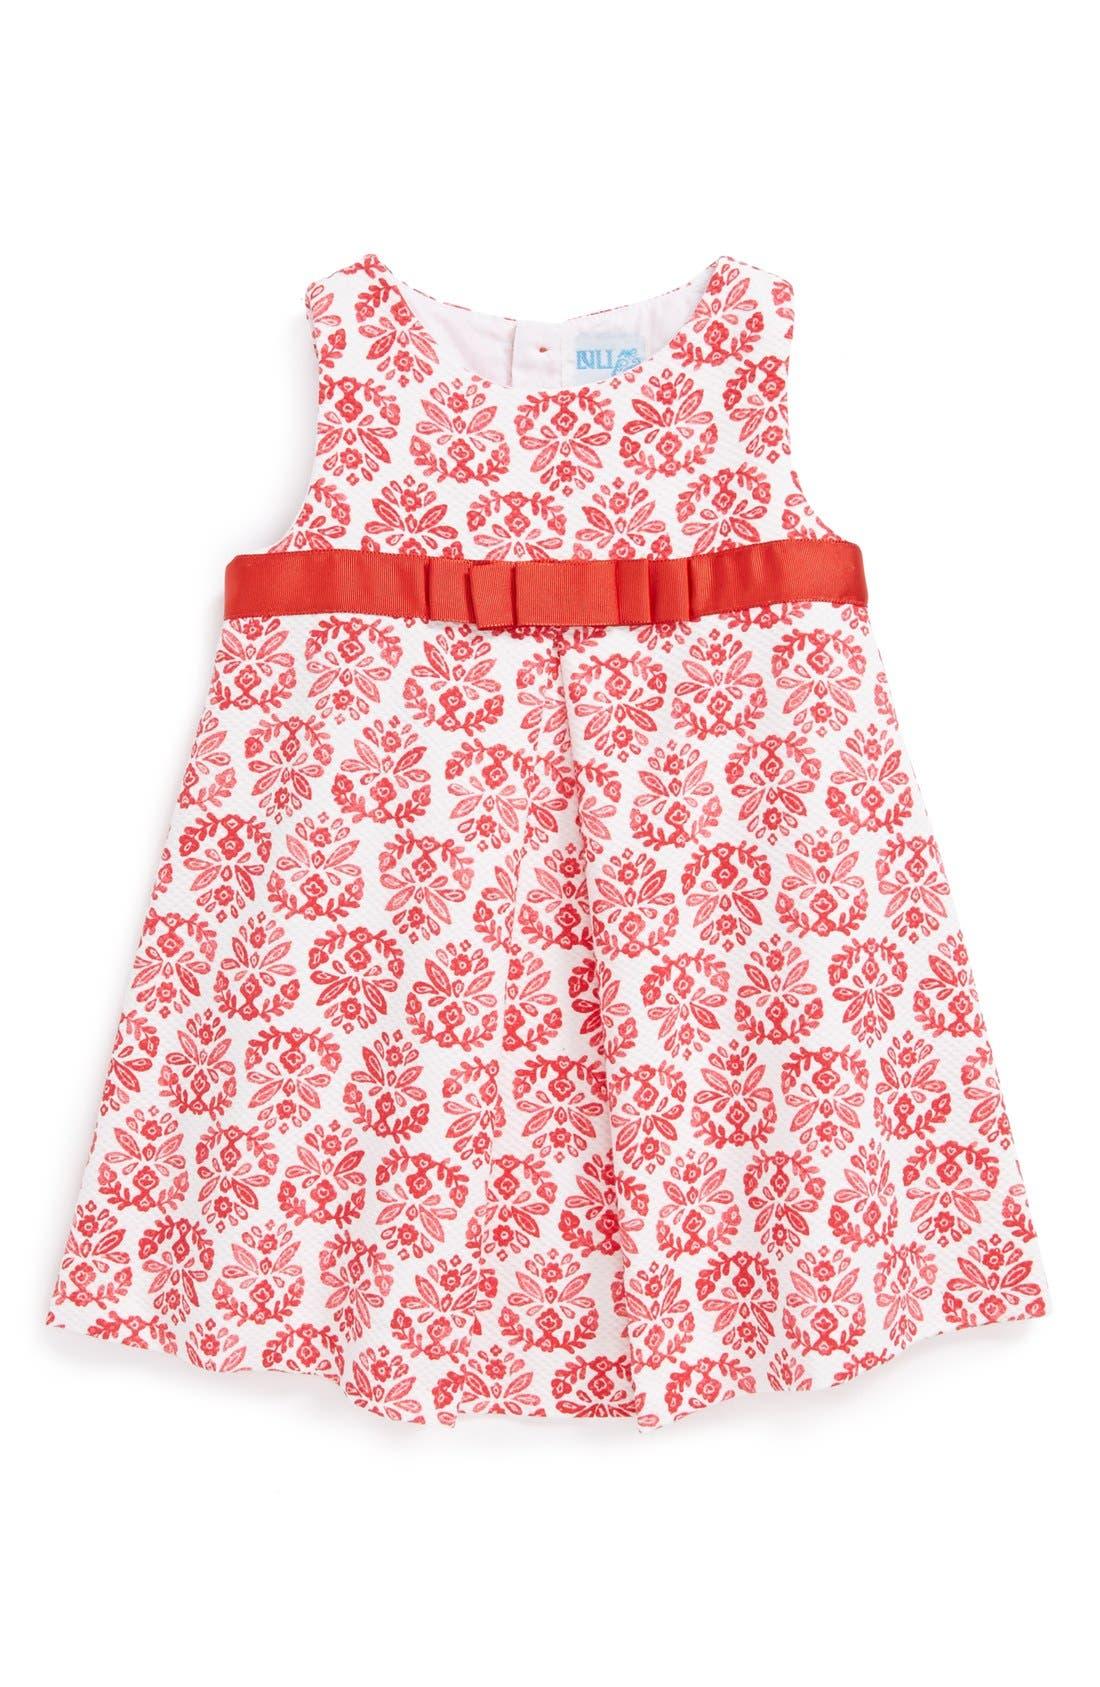 Alternate Image 1 Selected - Luli & Me Print Cotton & Linen A-Line Dress (Baby Girls)